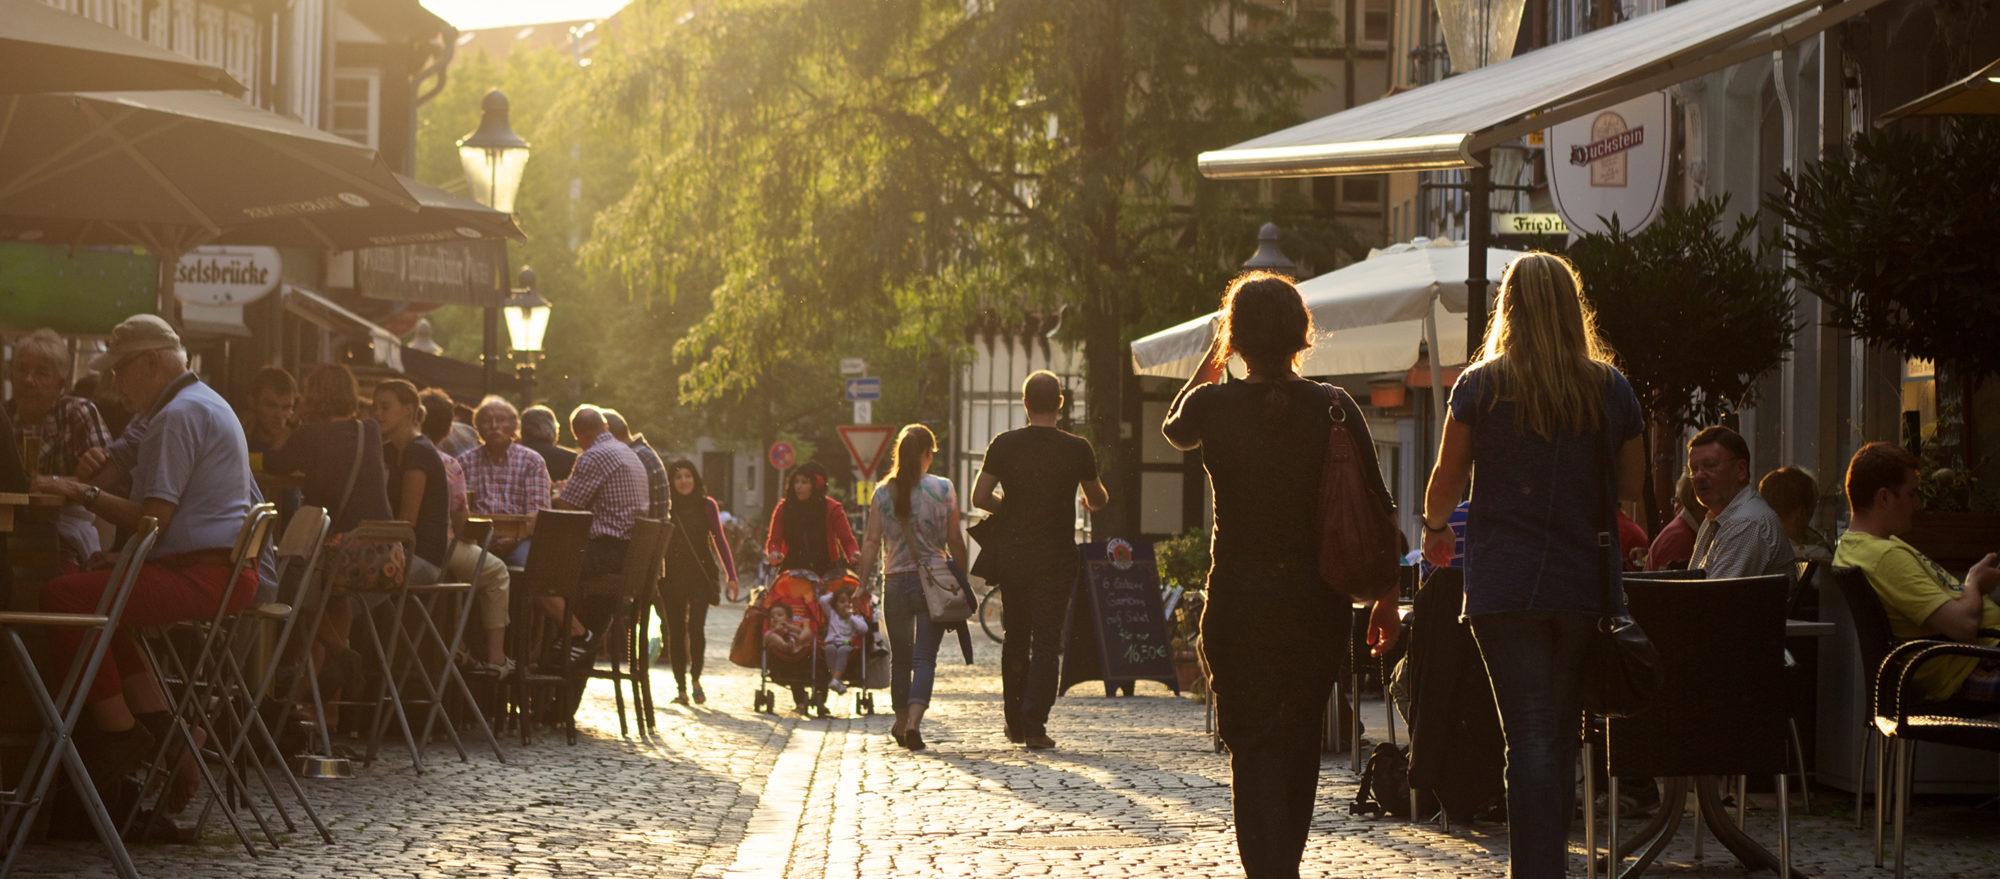 hautarzt altstadtmarkt braunschweig